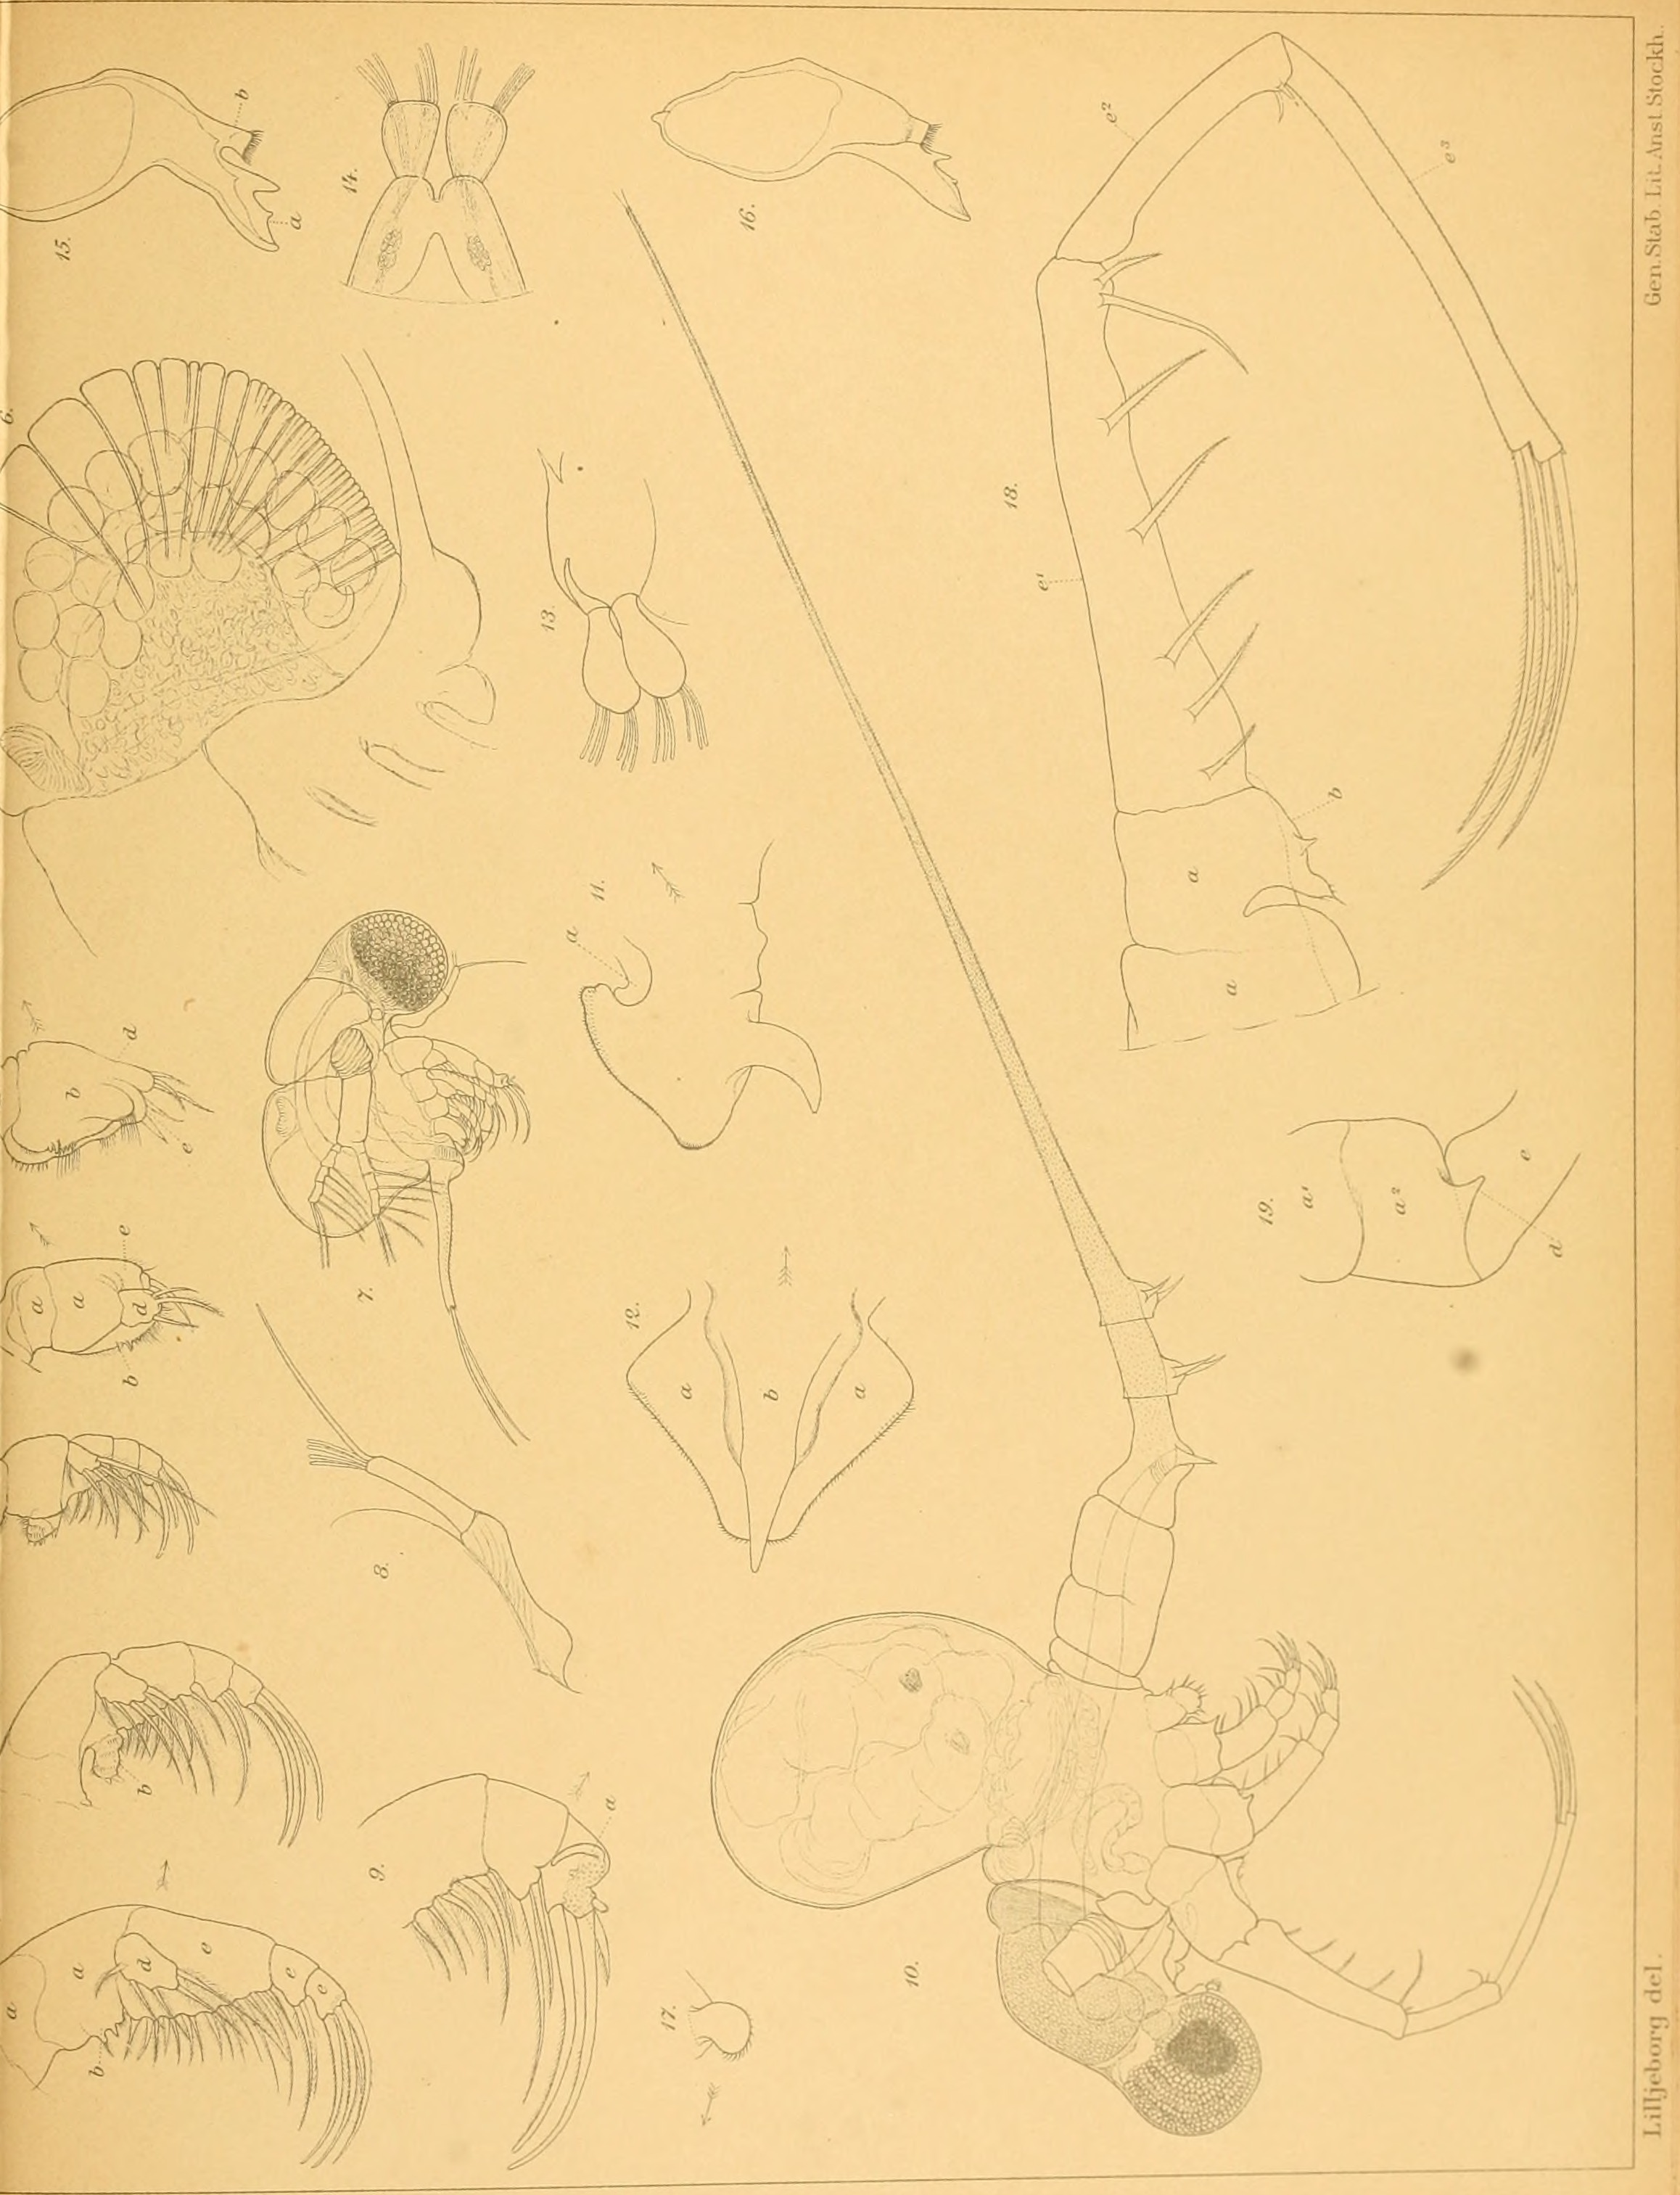 Image of cladocerans